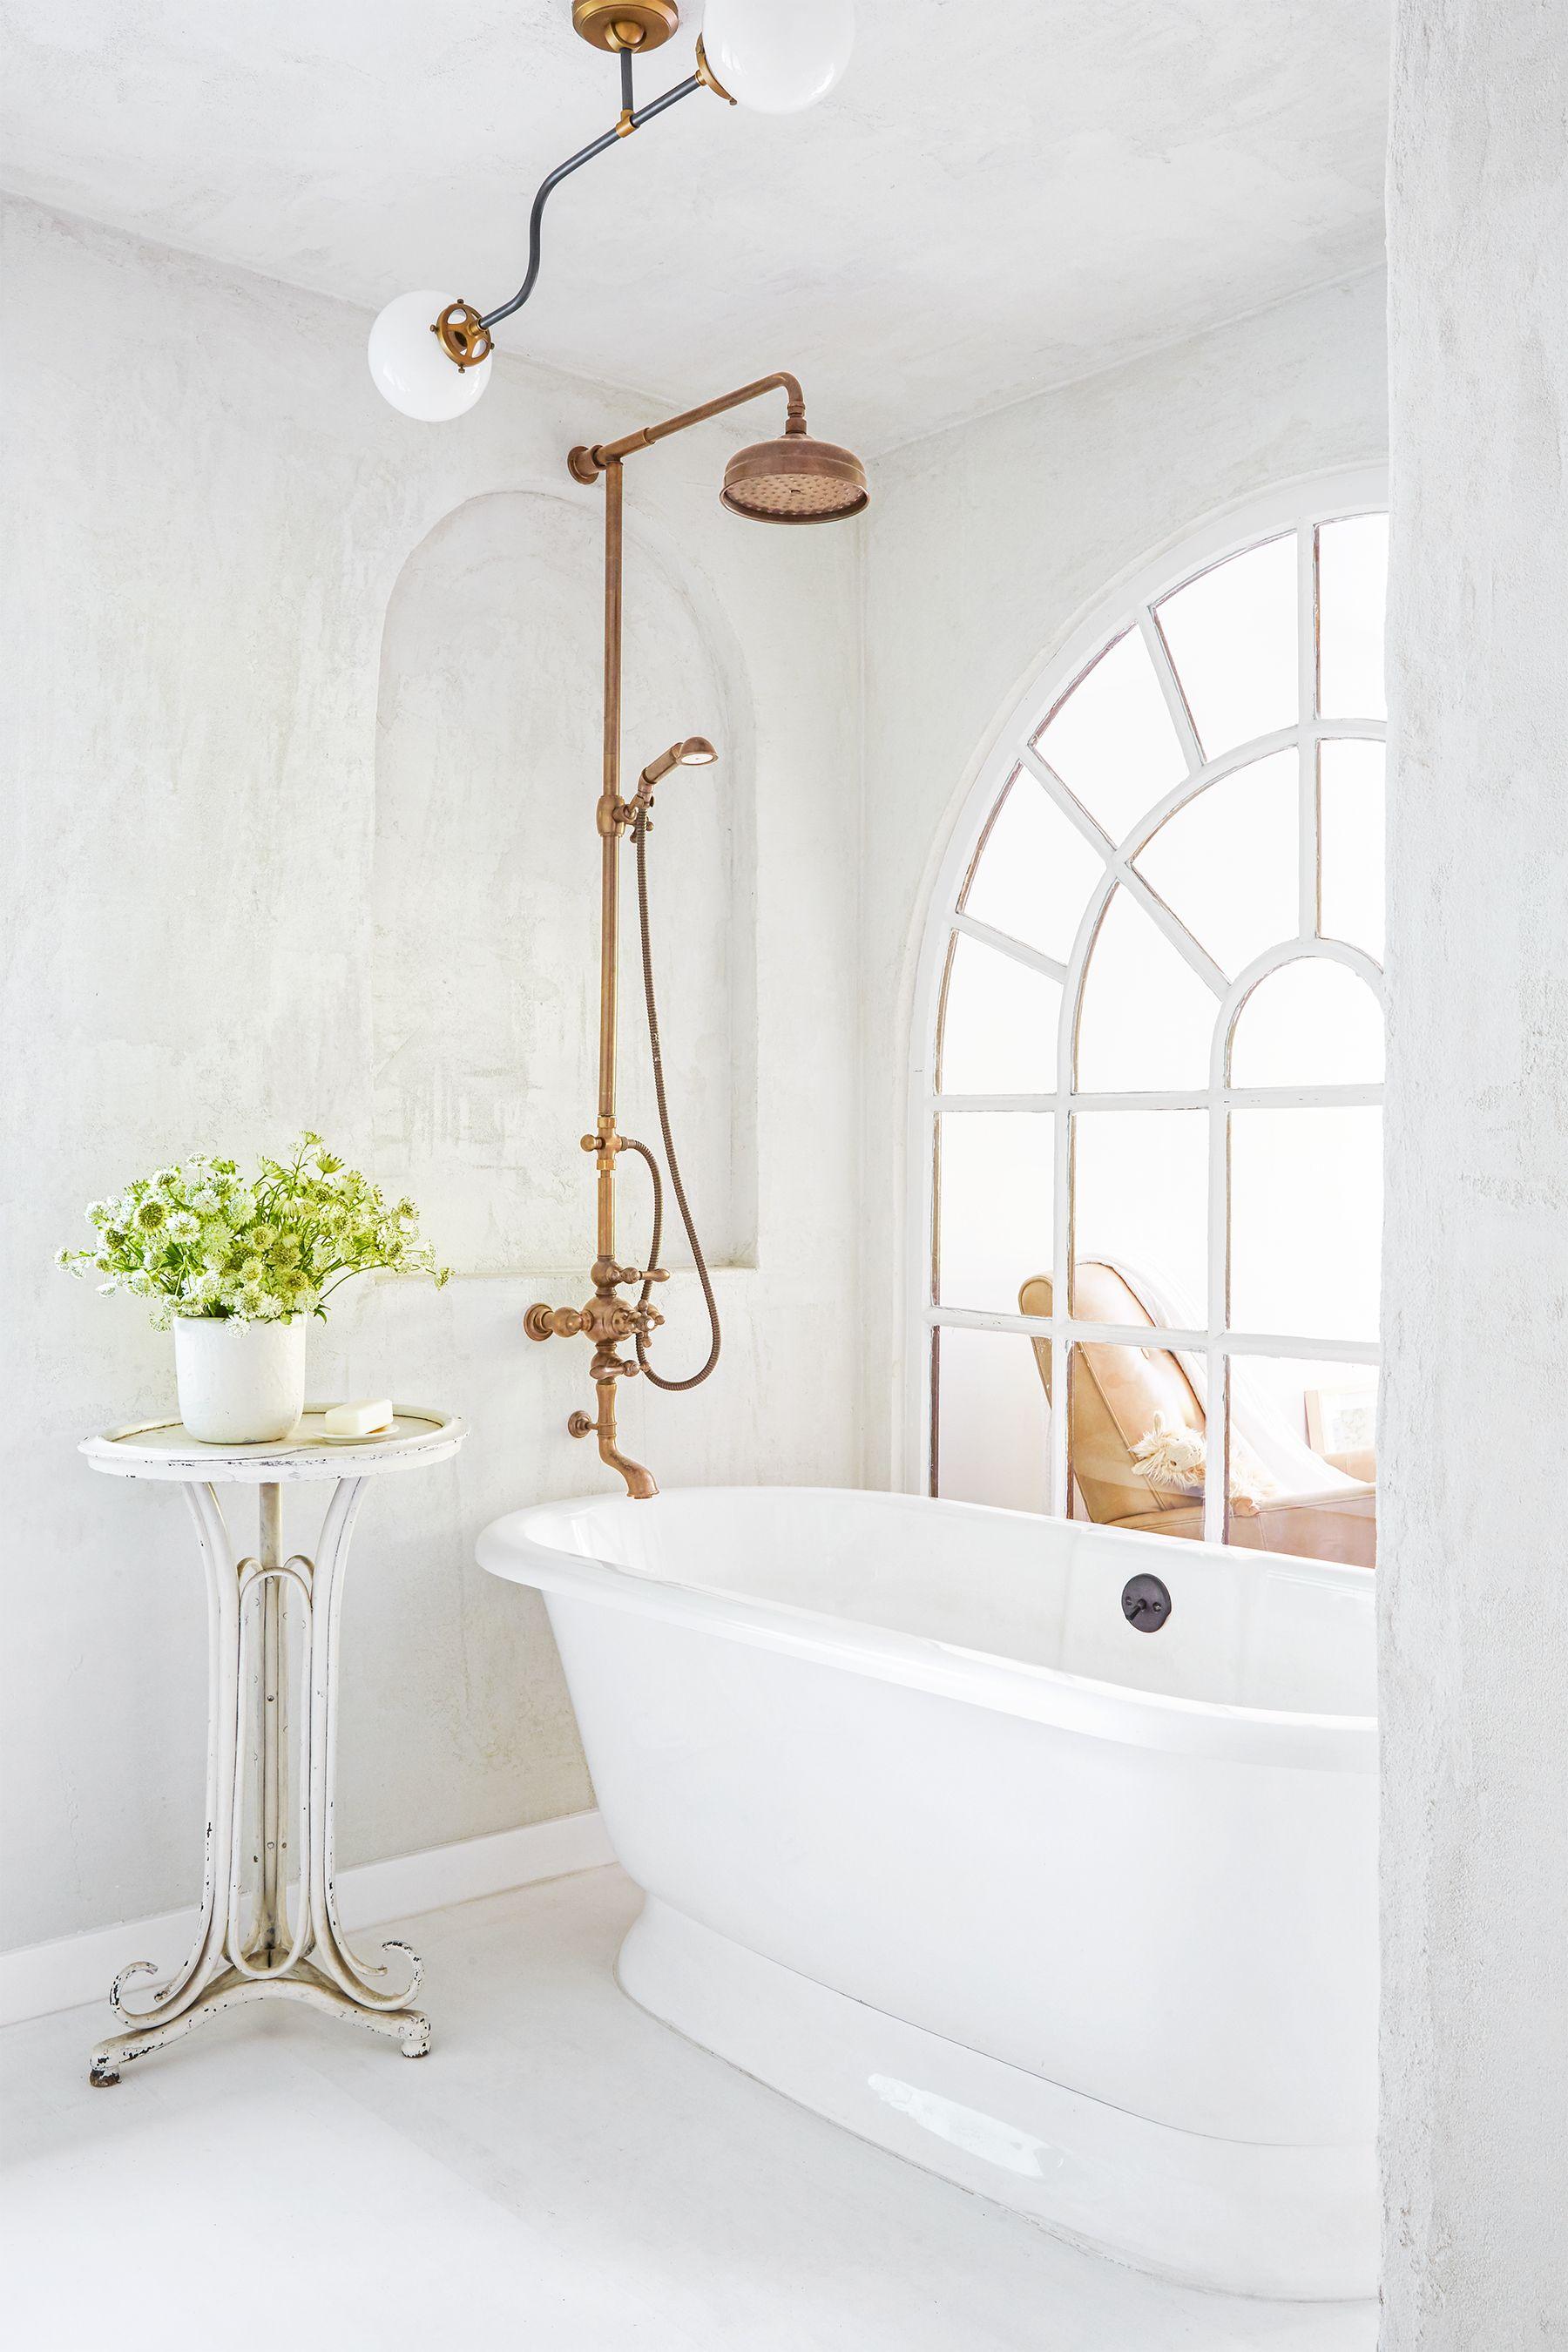 top paint colors for bathroom walls